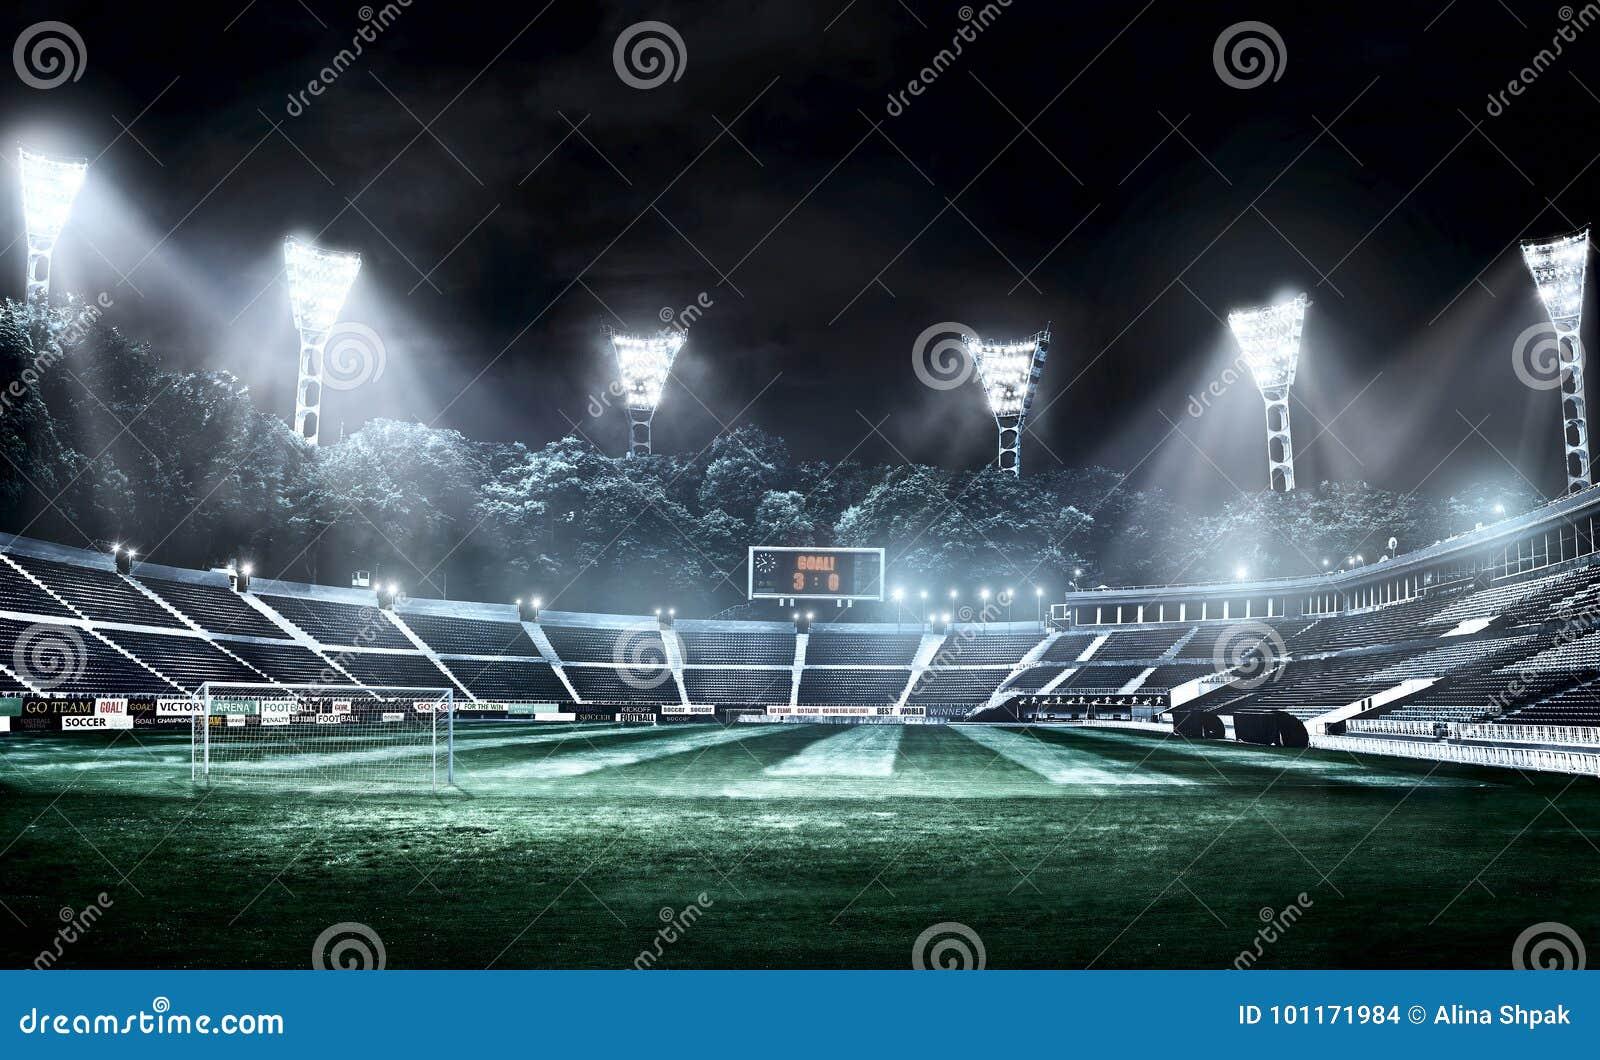 Leeres Fussballstadion In Den Hellen Strahlen Illustration An